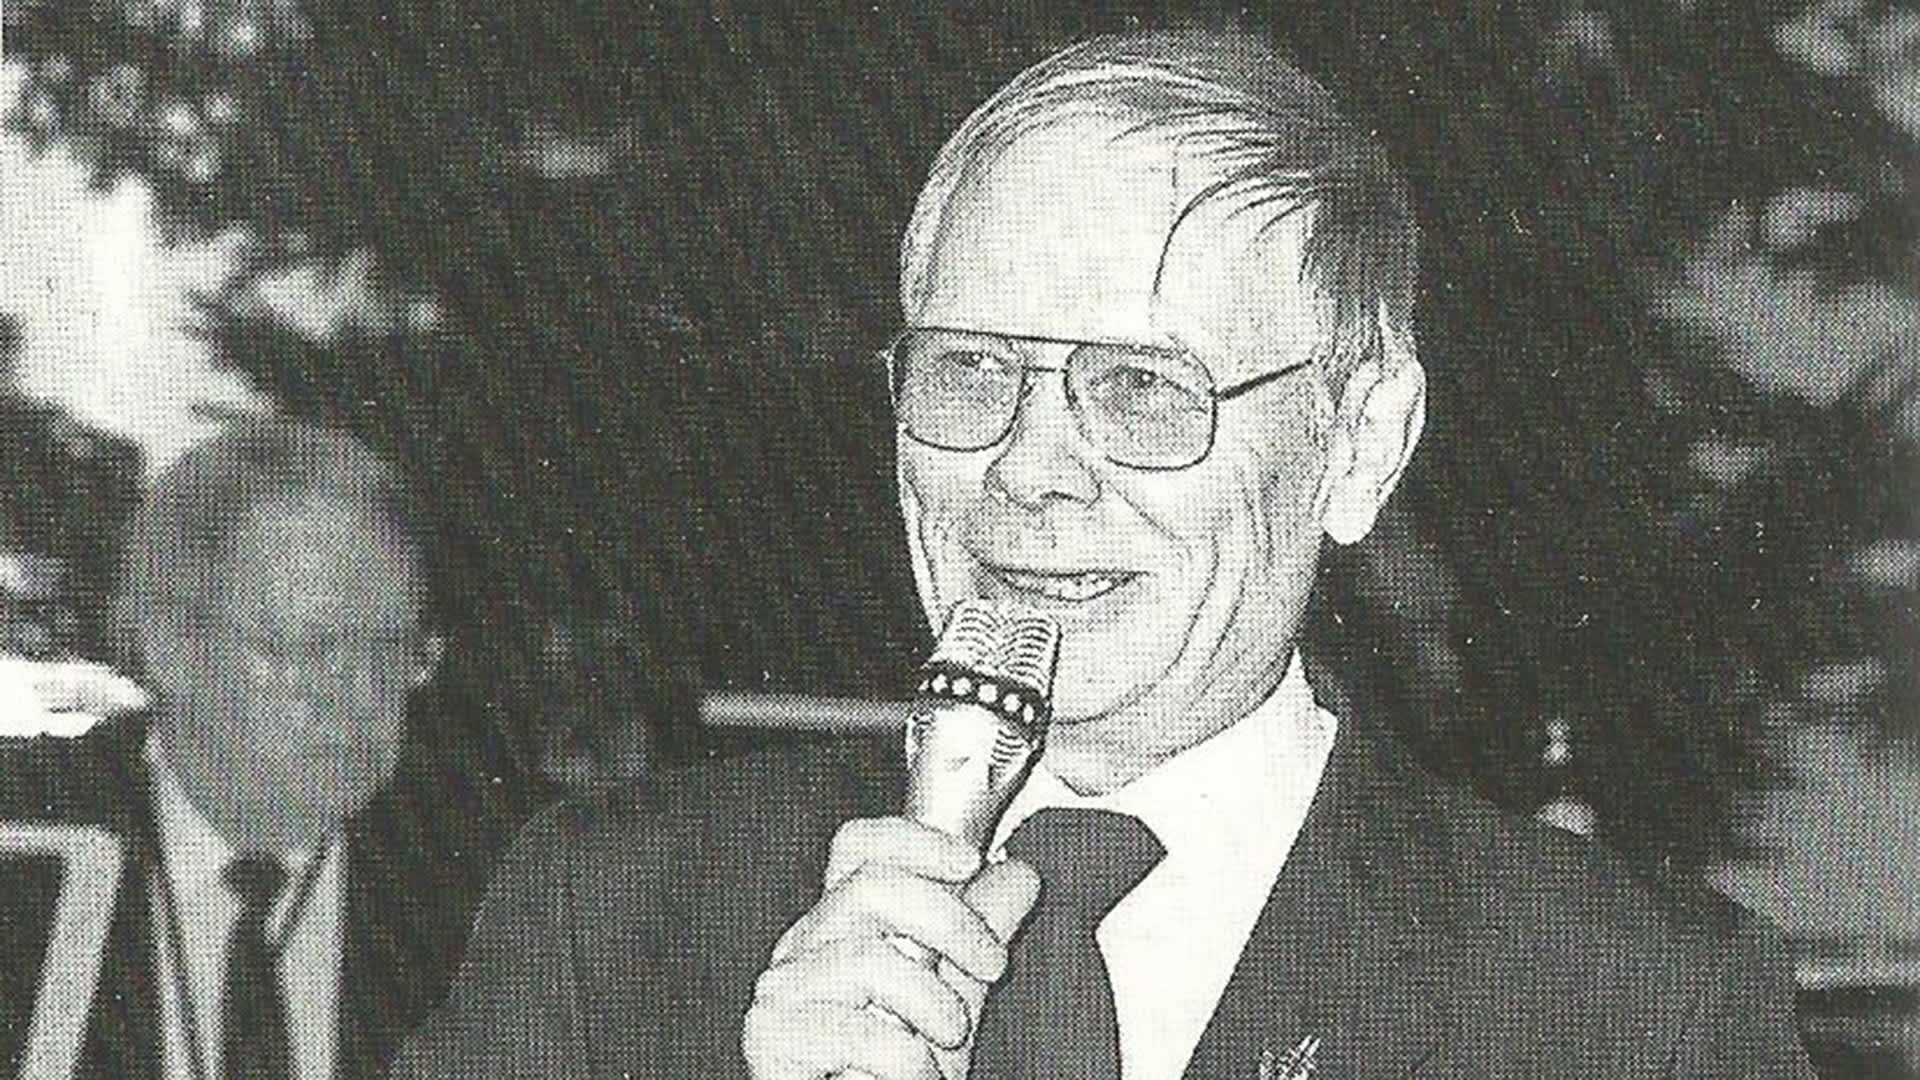 Olavi Spännäri